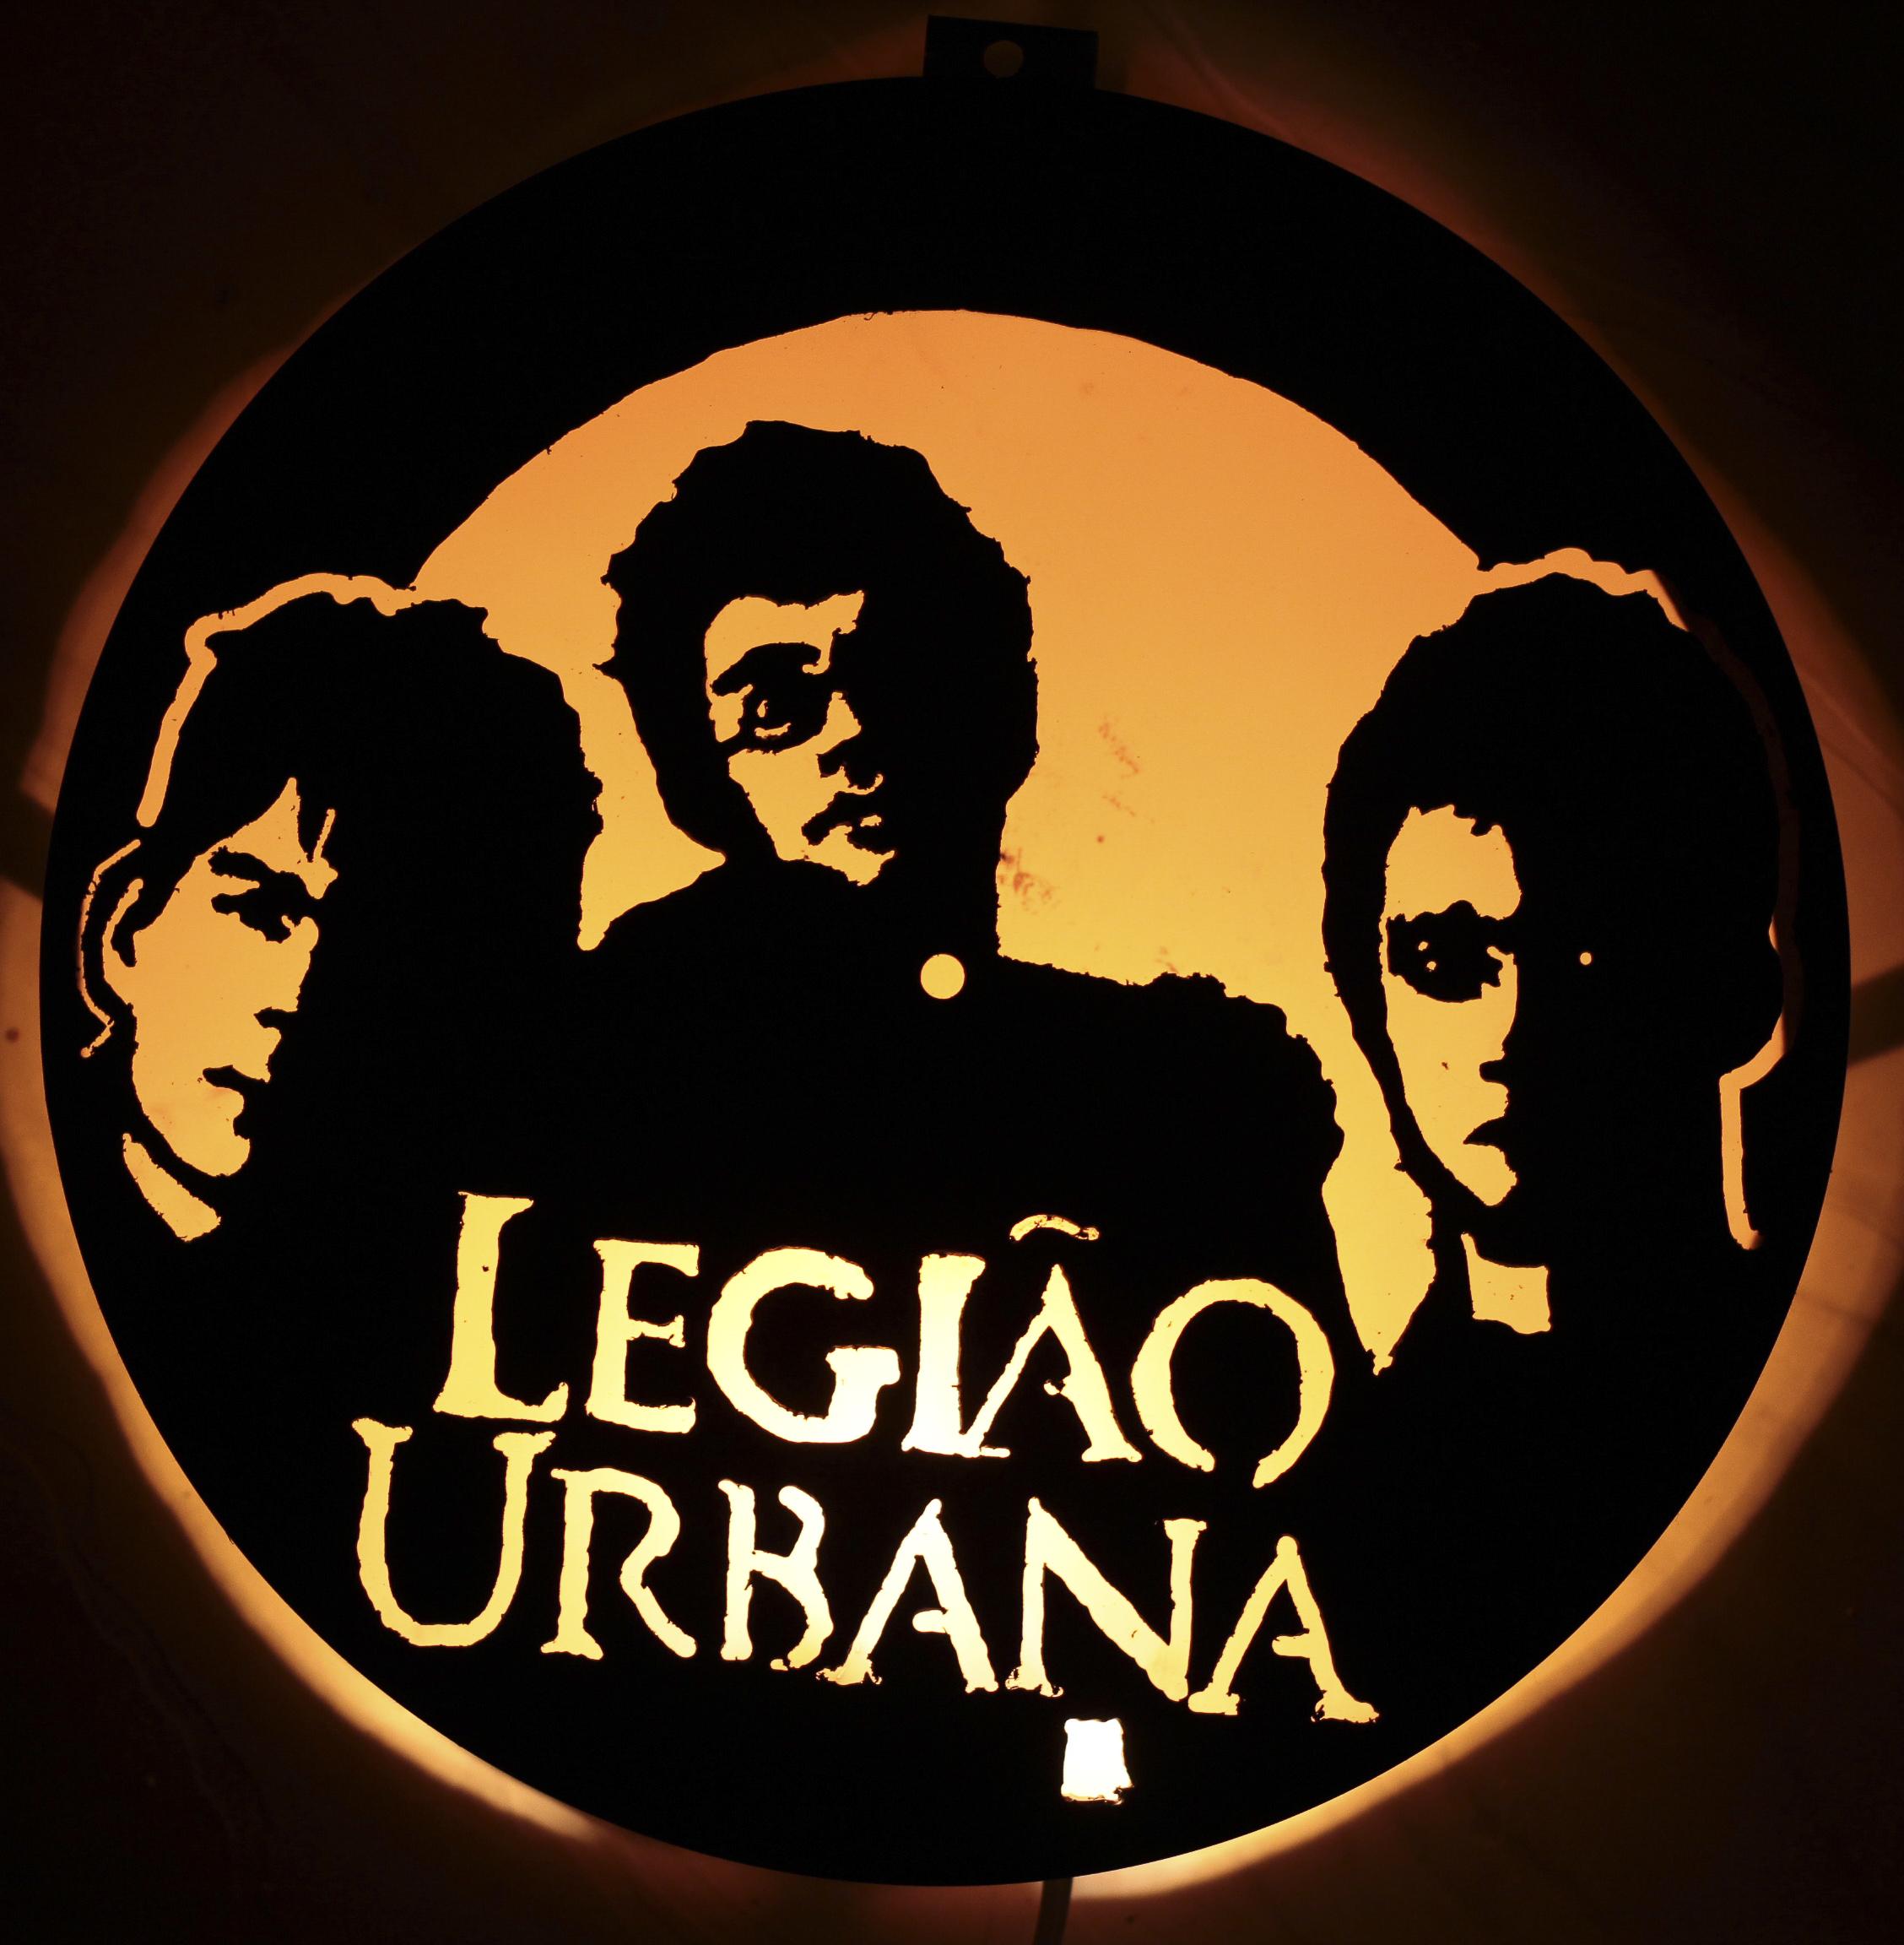 Legi0e3o urbana - perfil - album (itunes match aac m4a) exclusive